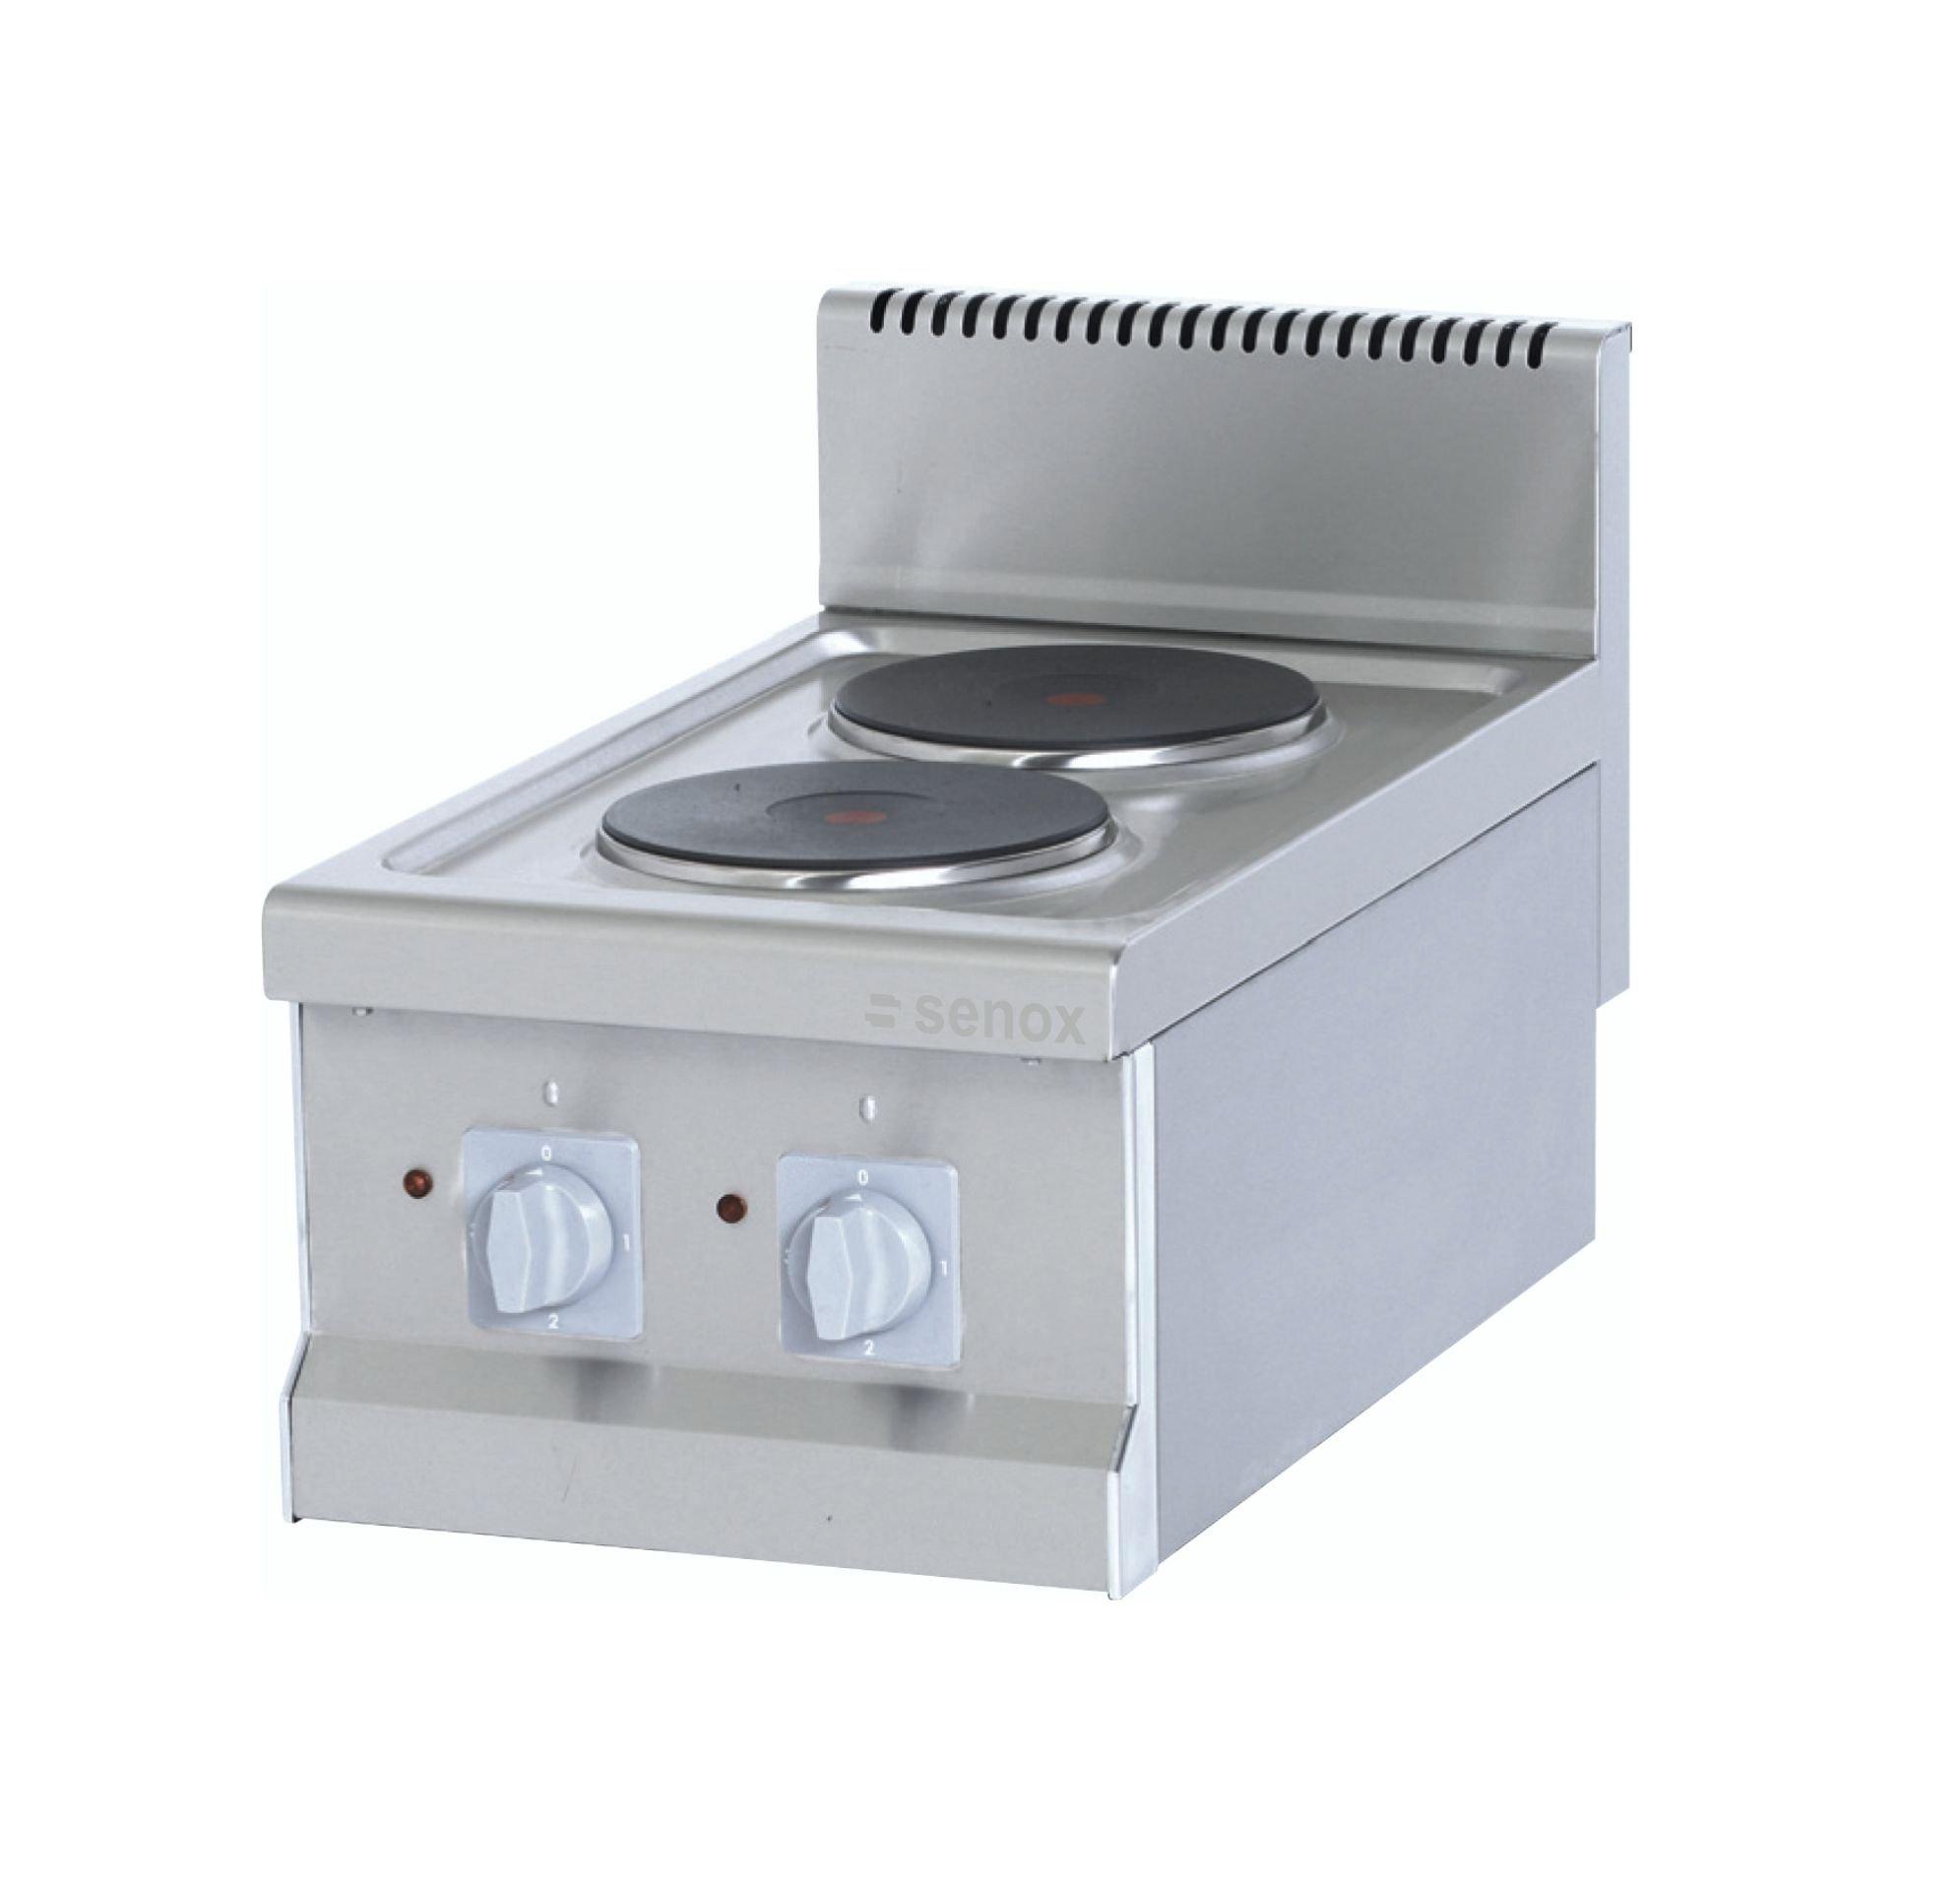 senox-aeo-470-setustu-elektrikli-ocak